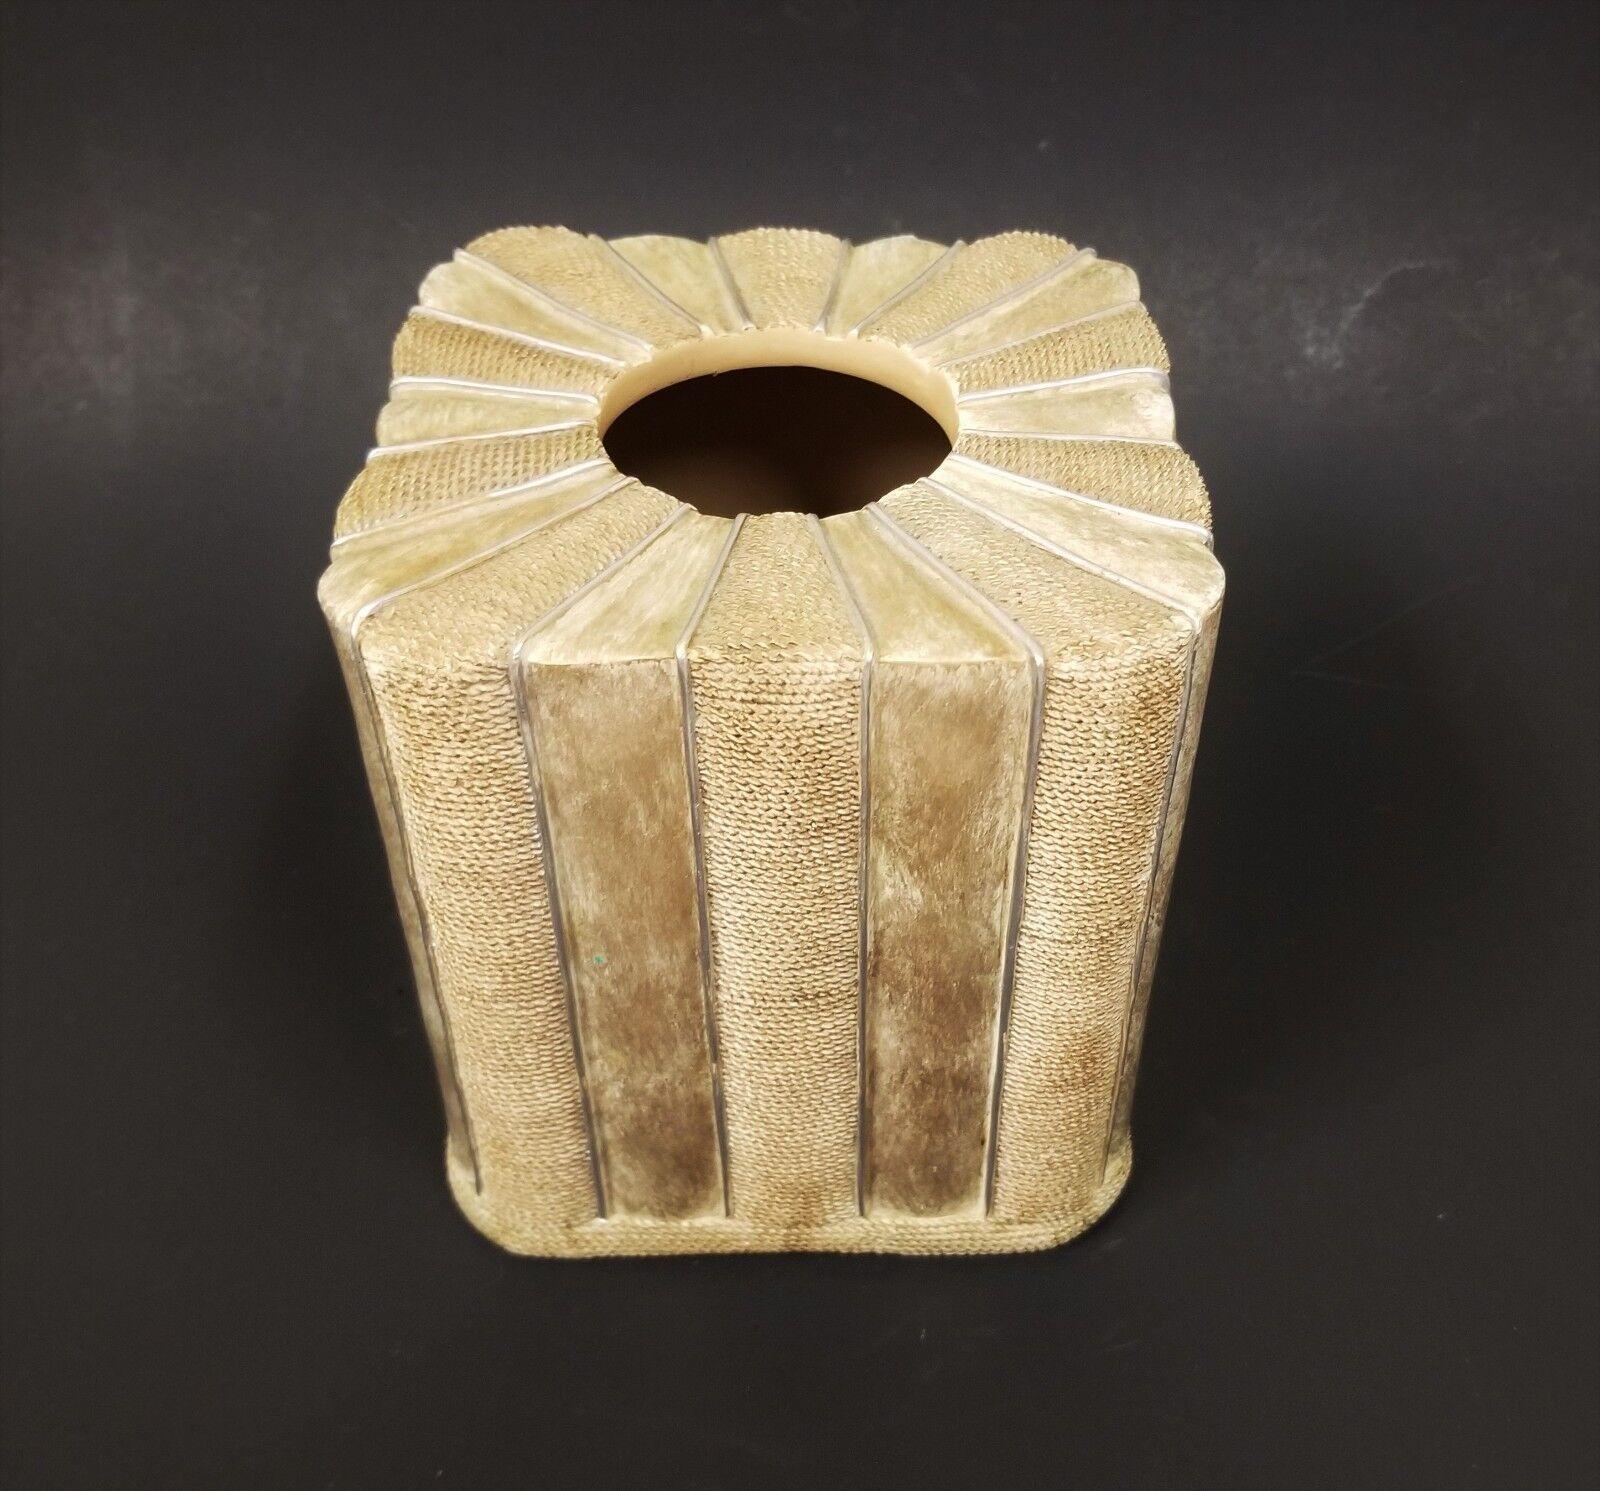 NEW KAREN LAWRENCE PALE Gold,BEIGE,CHAMPAGNE 3D RESIN TISSUE,NAPKIN HOLDER CASE